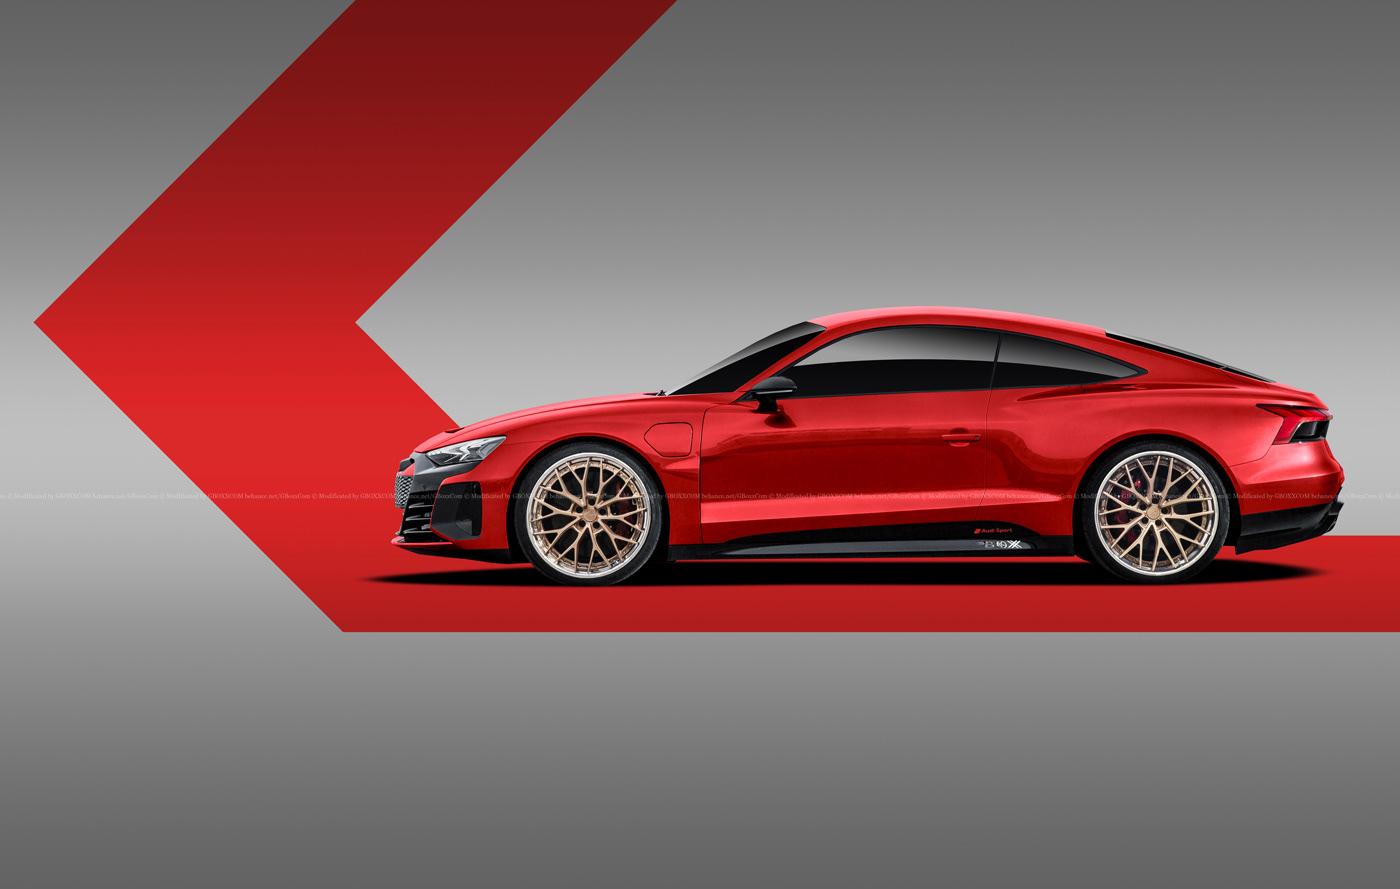 Audi E-Tron GT Spyder, E-Tron GT Wagon, E-Tron GT Coupe Renderings (3)